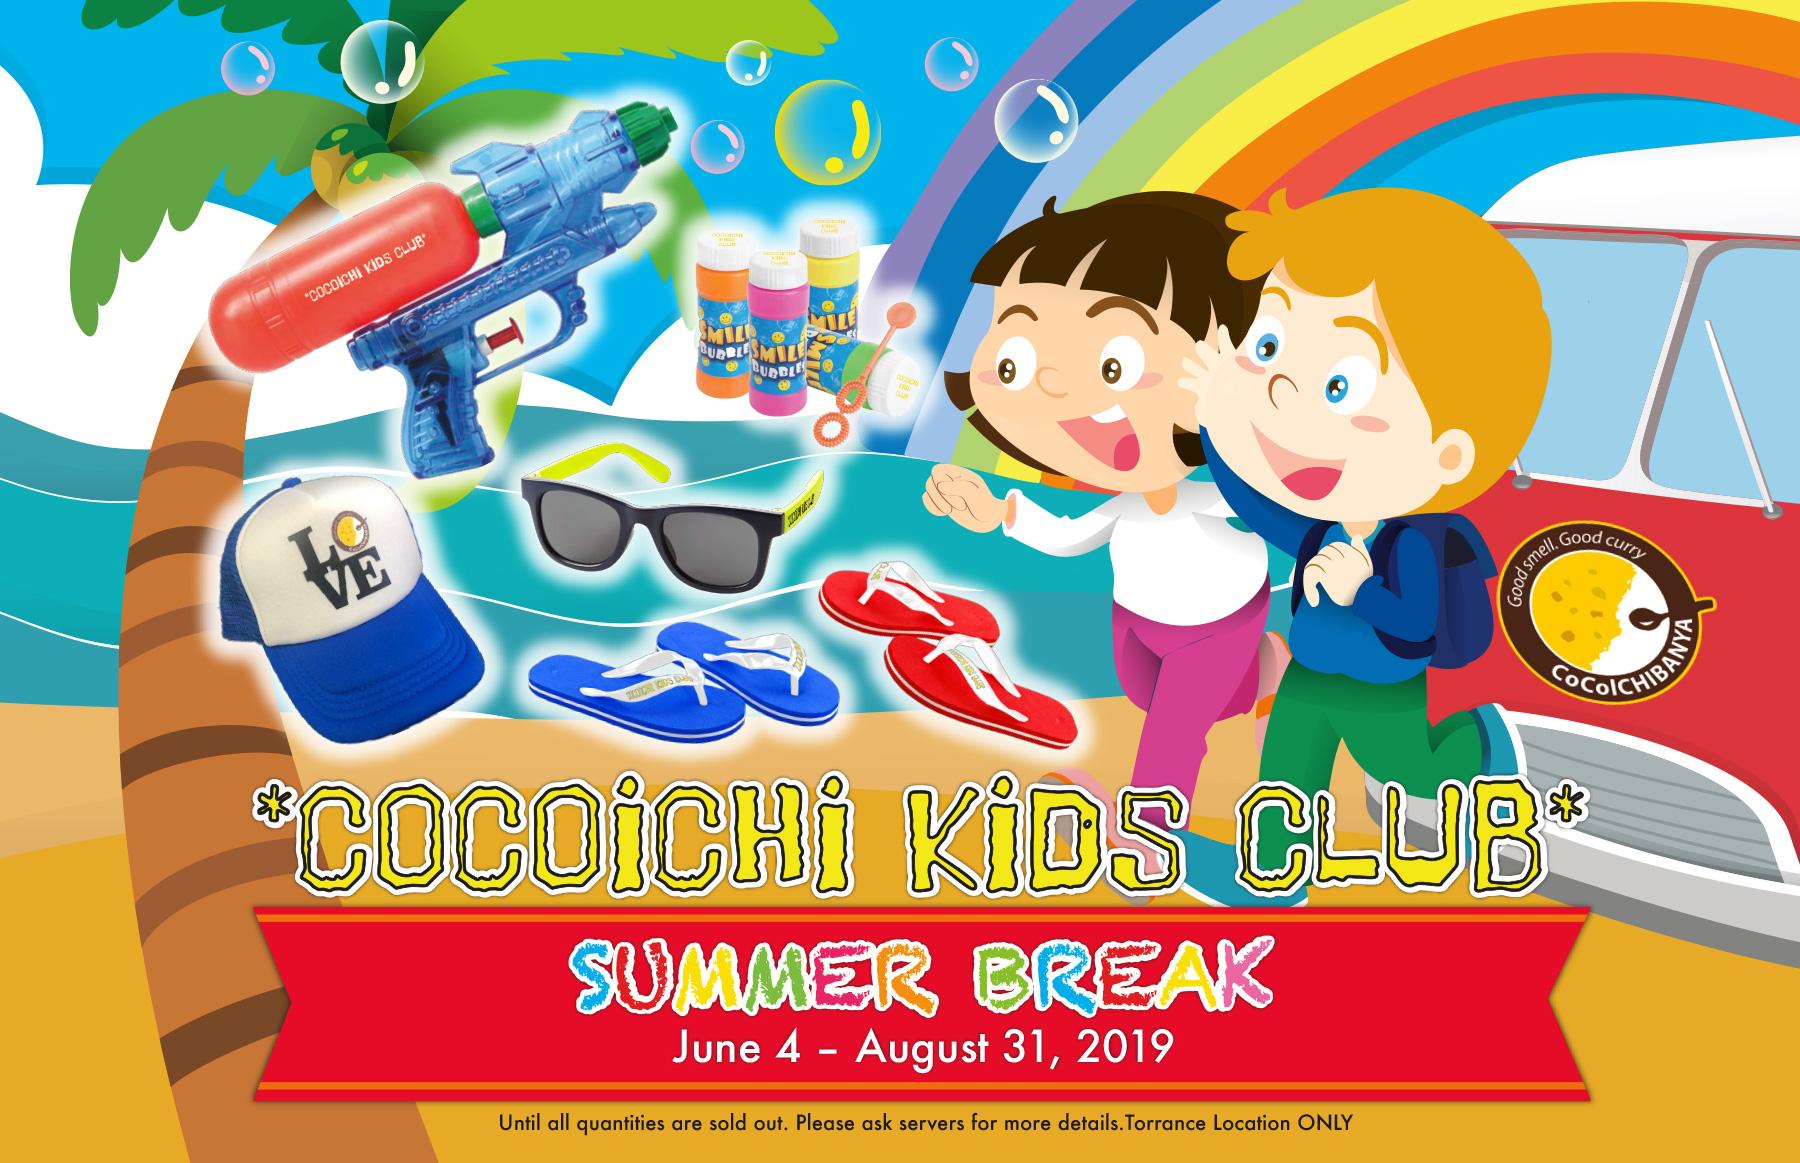 cocoichi_kids_club_20190529.jpg